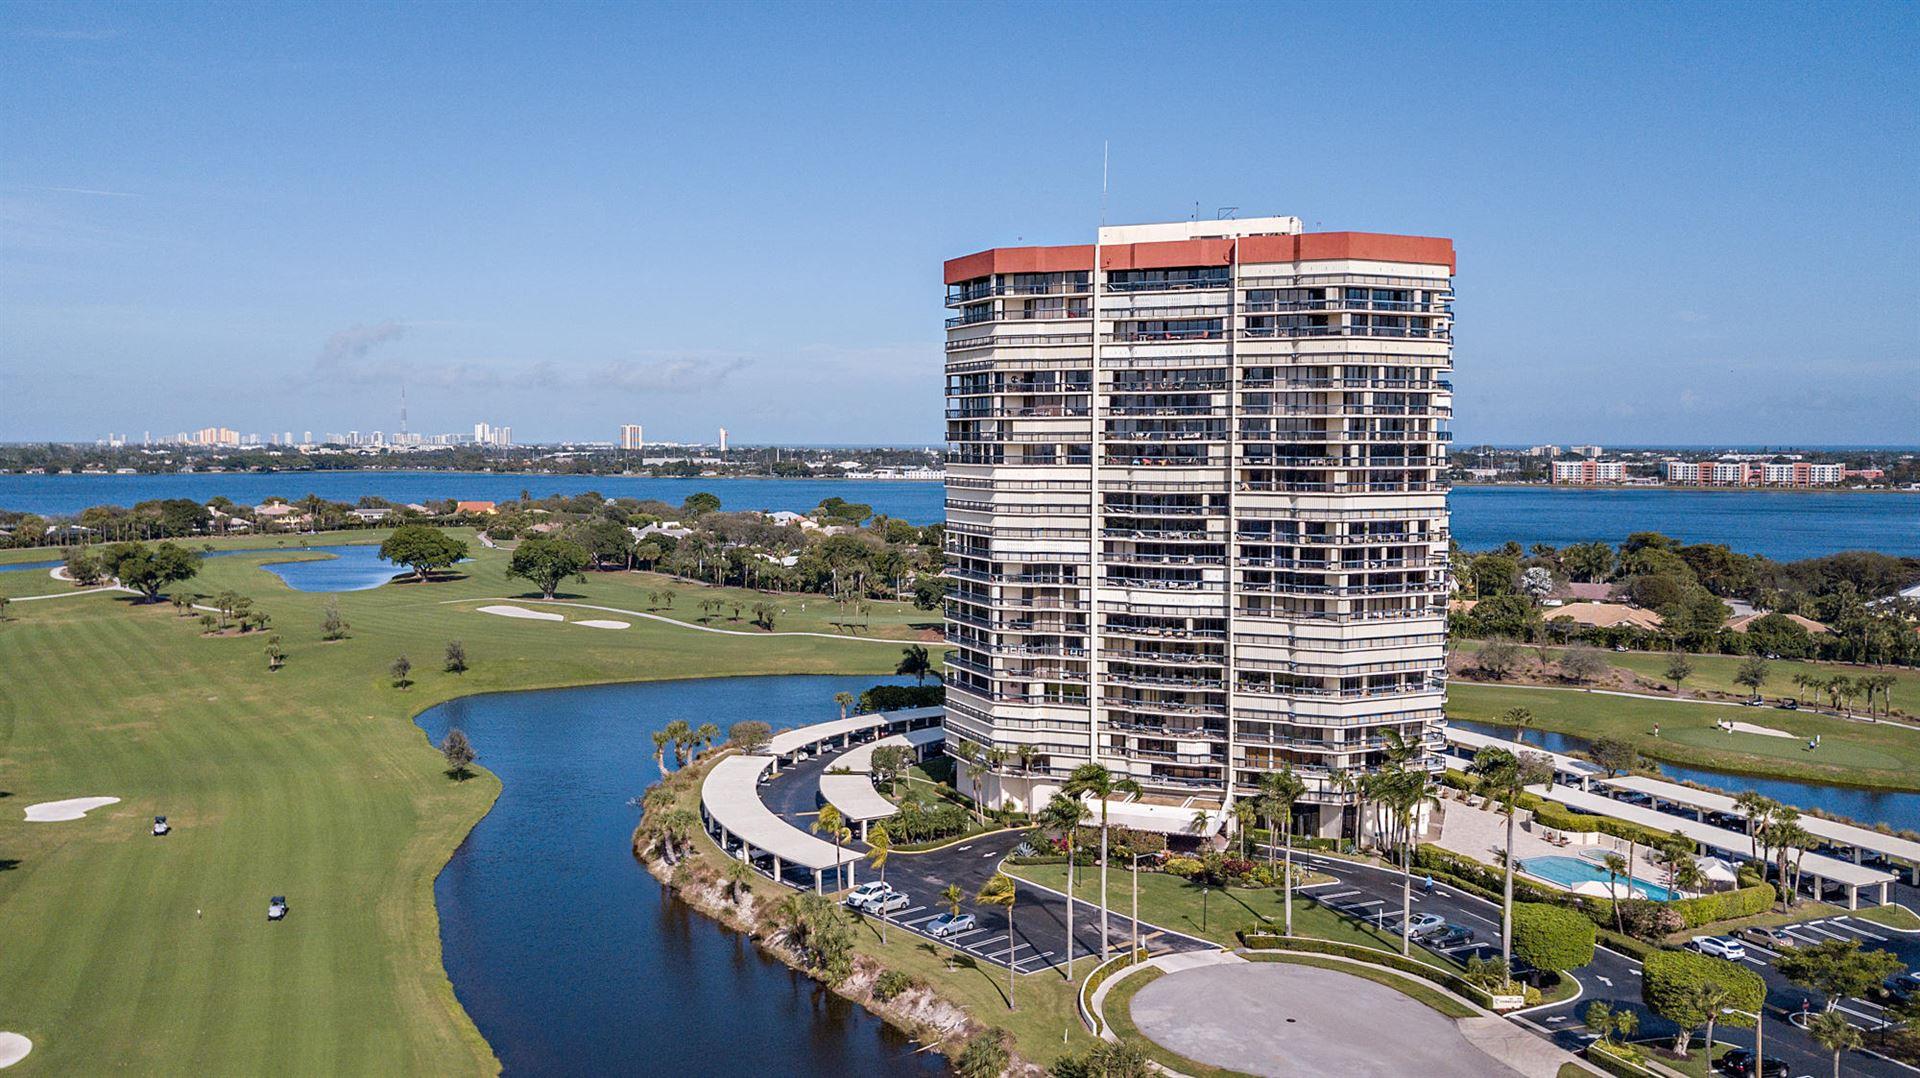 1900 Consulate Place #406, West Palm Beach, FL 33401 - MLS#: RX-10698327